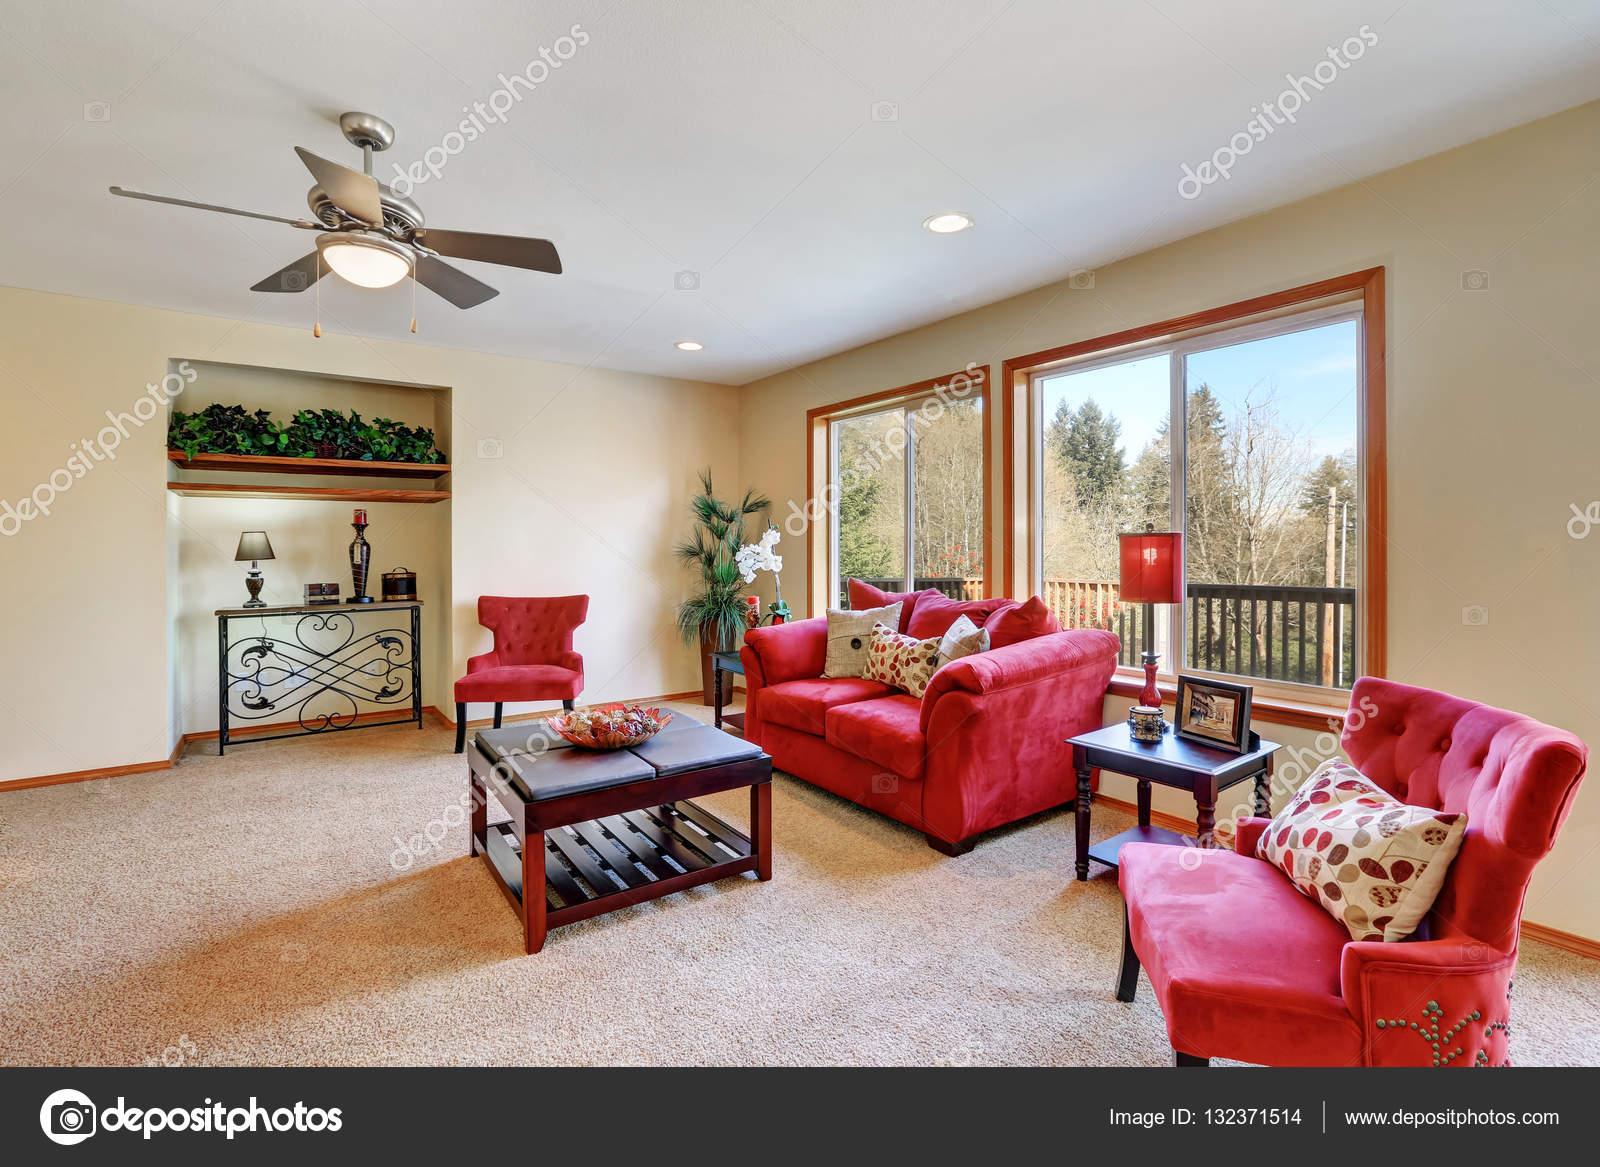 Gezellige woonkamer interieur met rood fluweel meubilair — Stockfoto ...